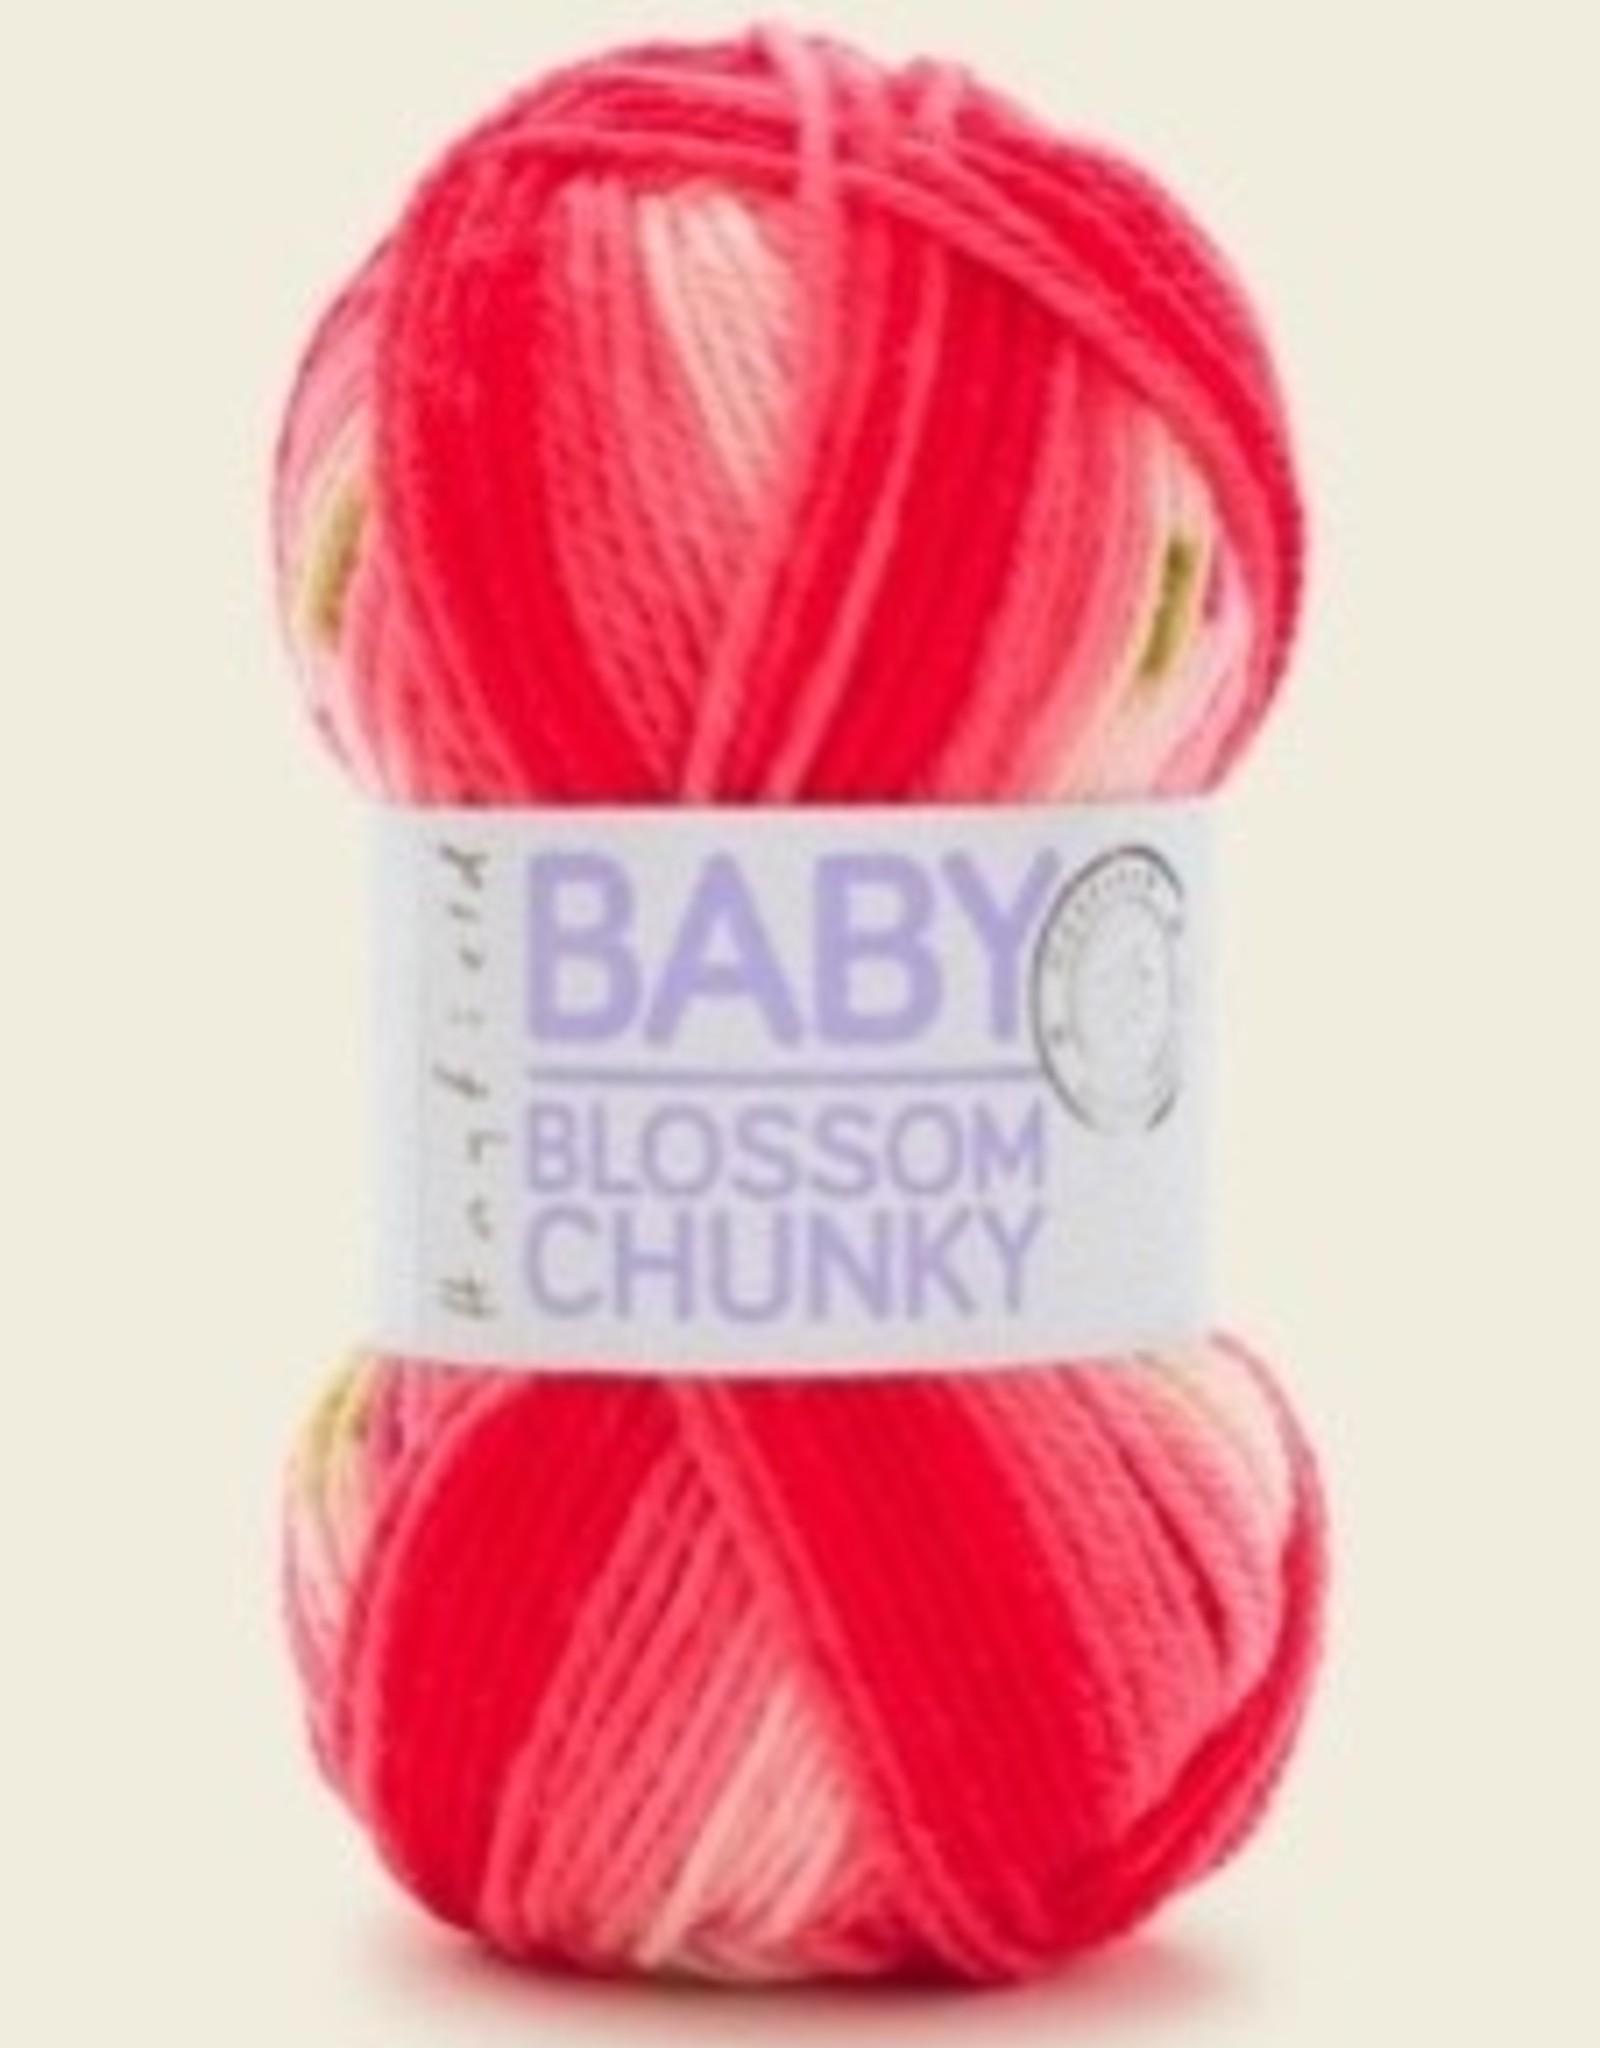 Berroco Hayfield Baby Blossom Chunky